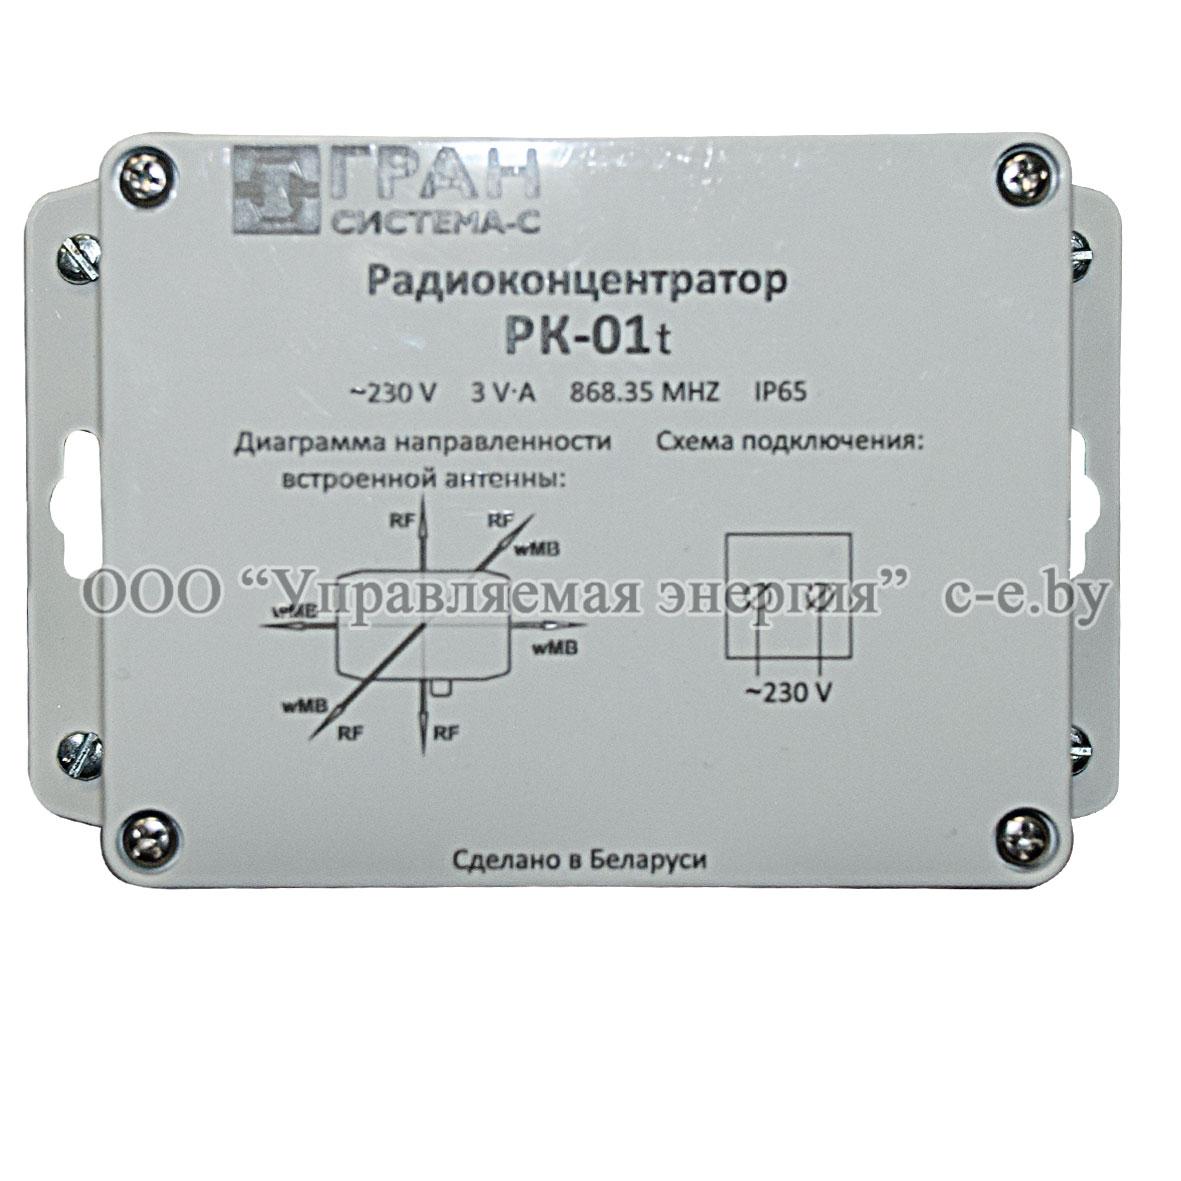 Радиоконцентратор РК-01t